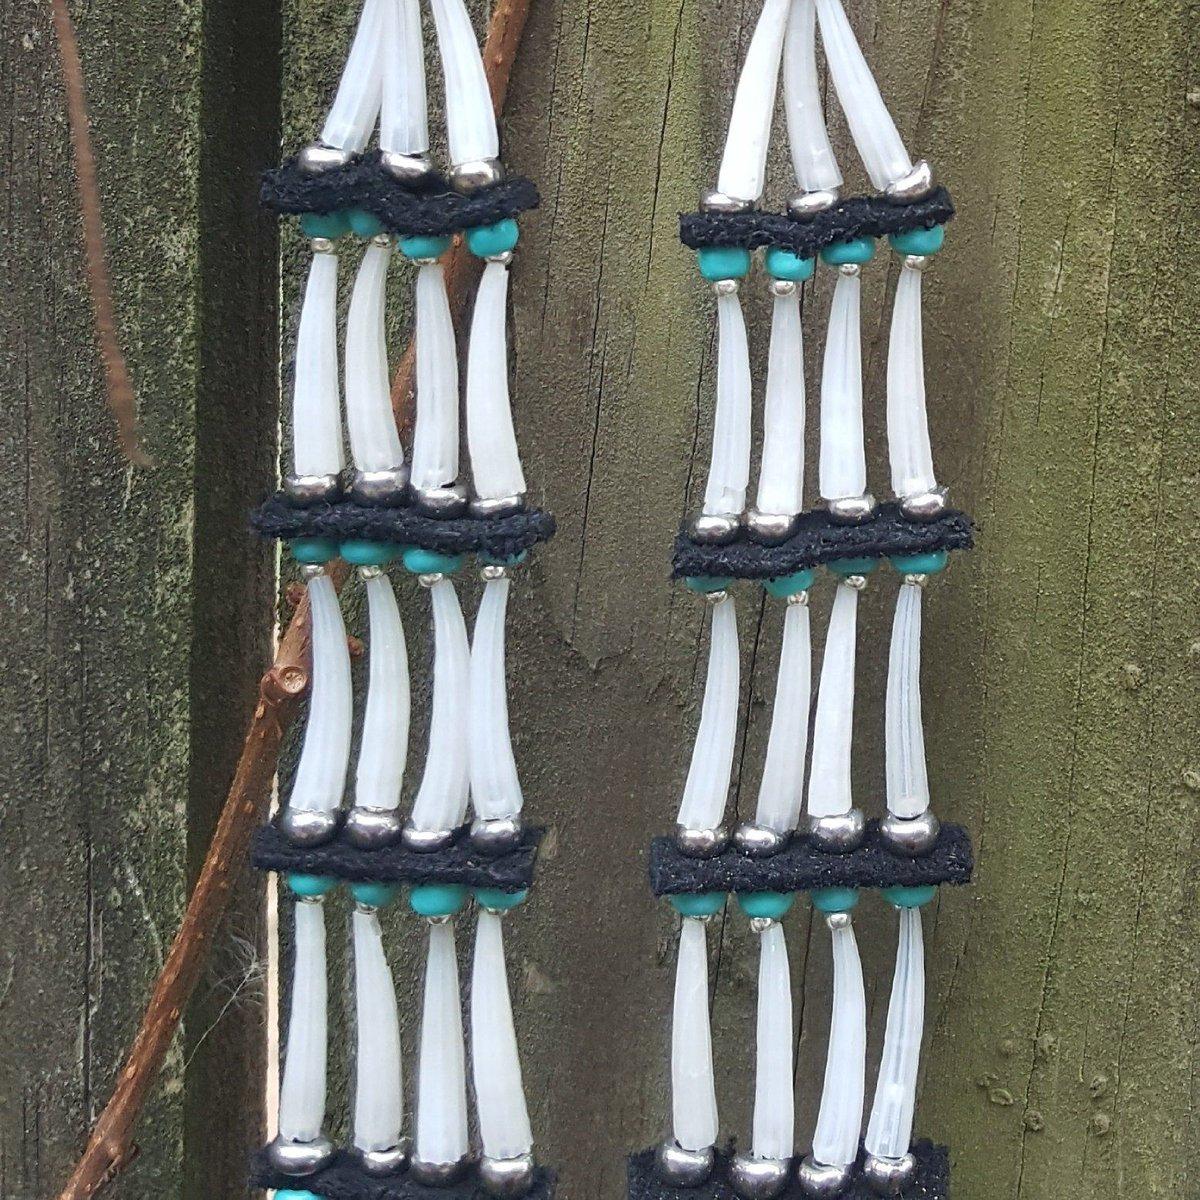 Please check out my Etsy shop! #beadwork #NativeTwitter #AlaskaNative #FirstNations #Statimc #Unangax #Aleut #NativeMade #BuyNative  https://buff.ly/33jBE9fpic.twitter.com/SVjT312juK